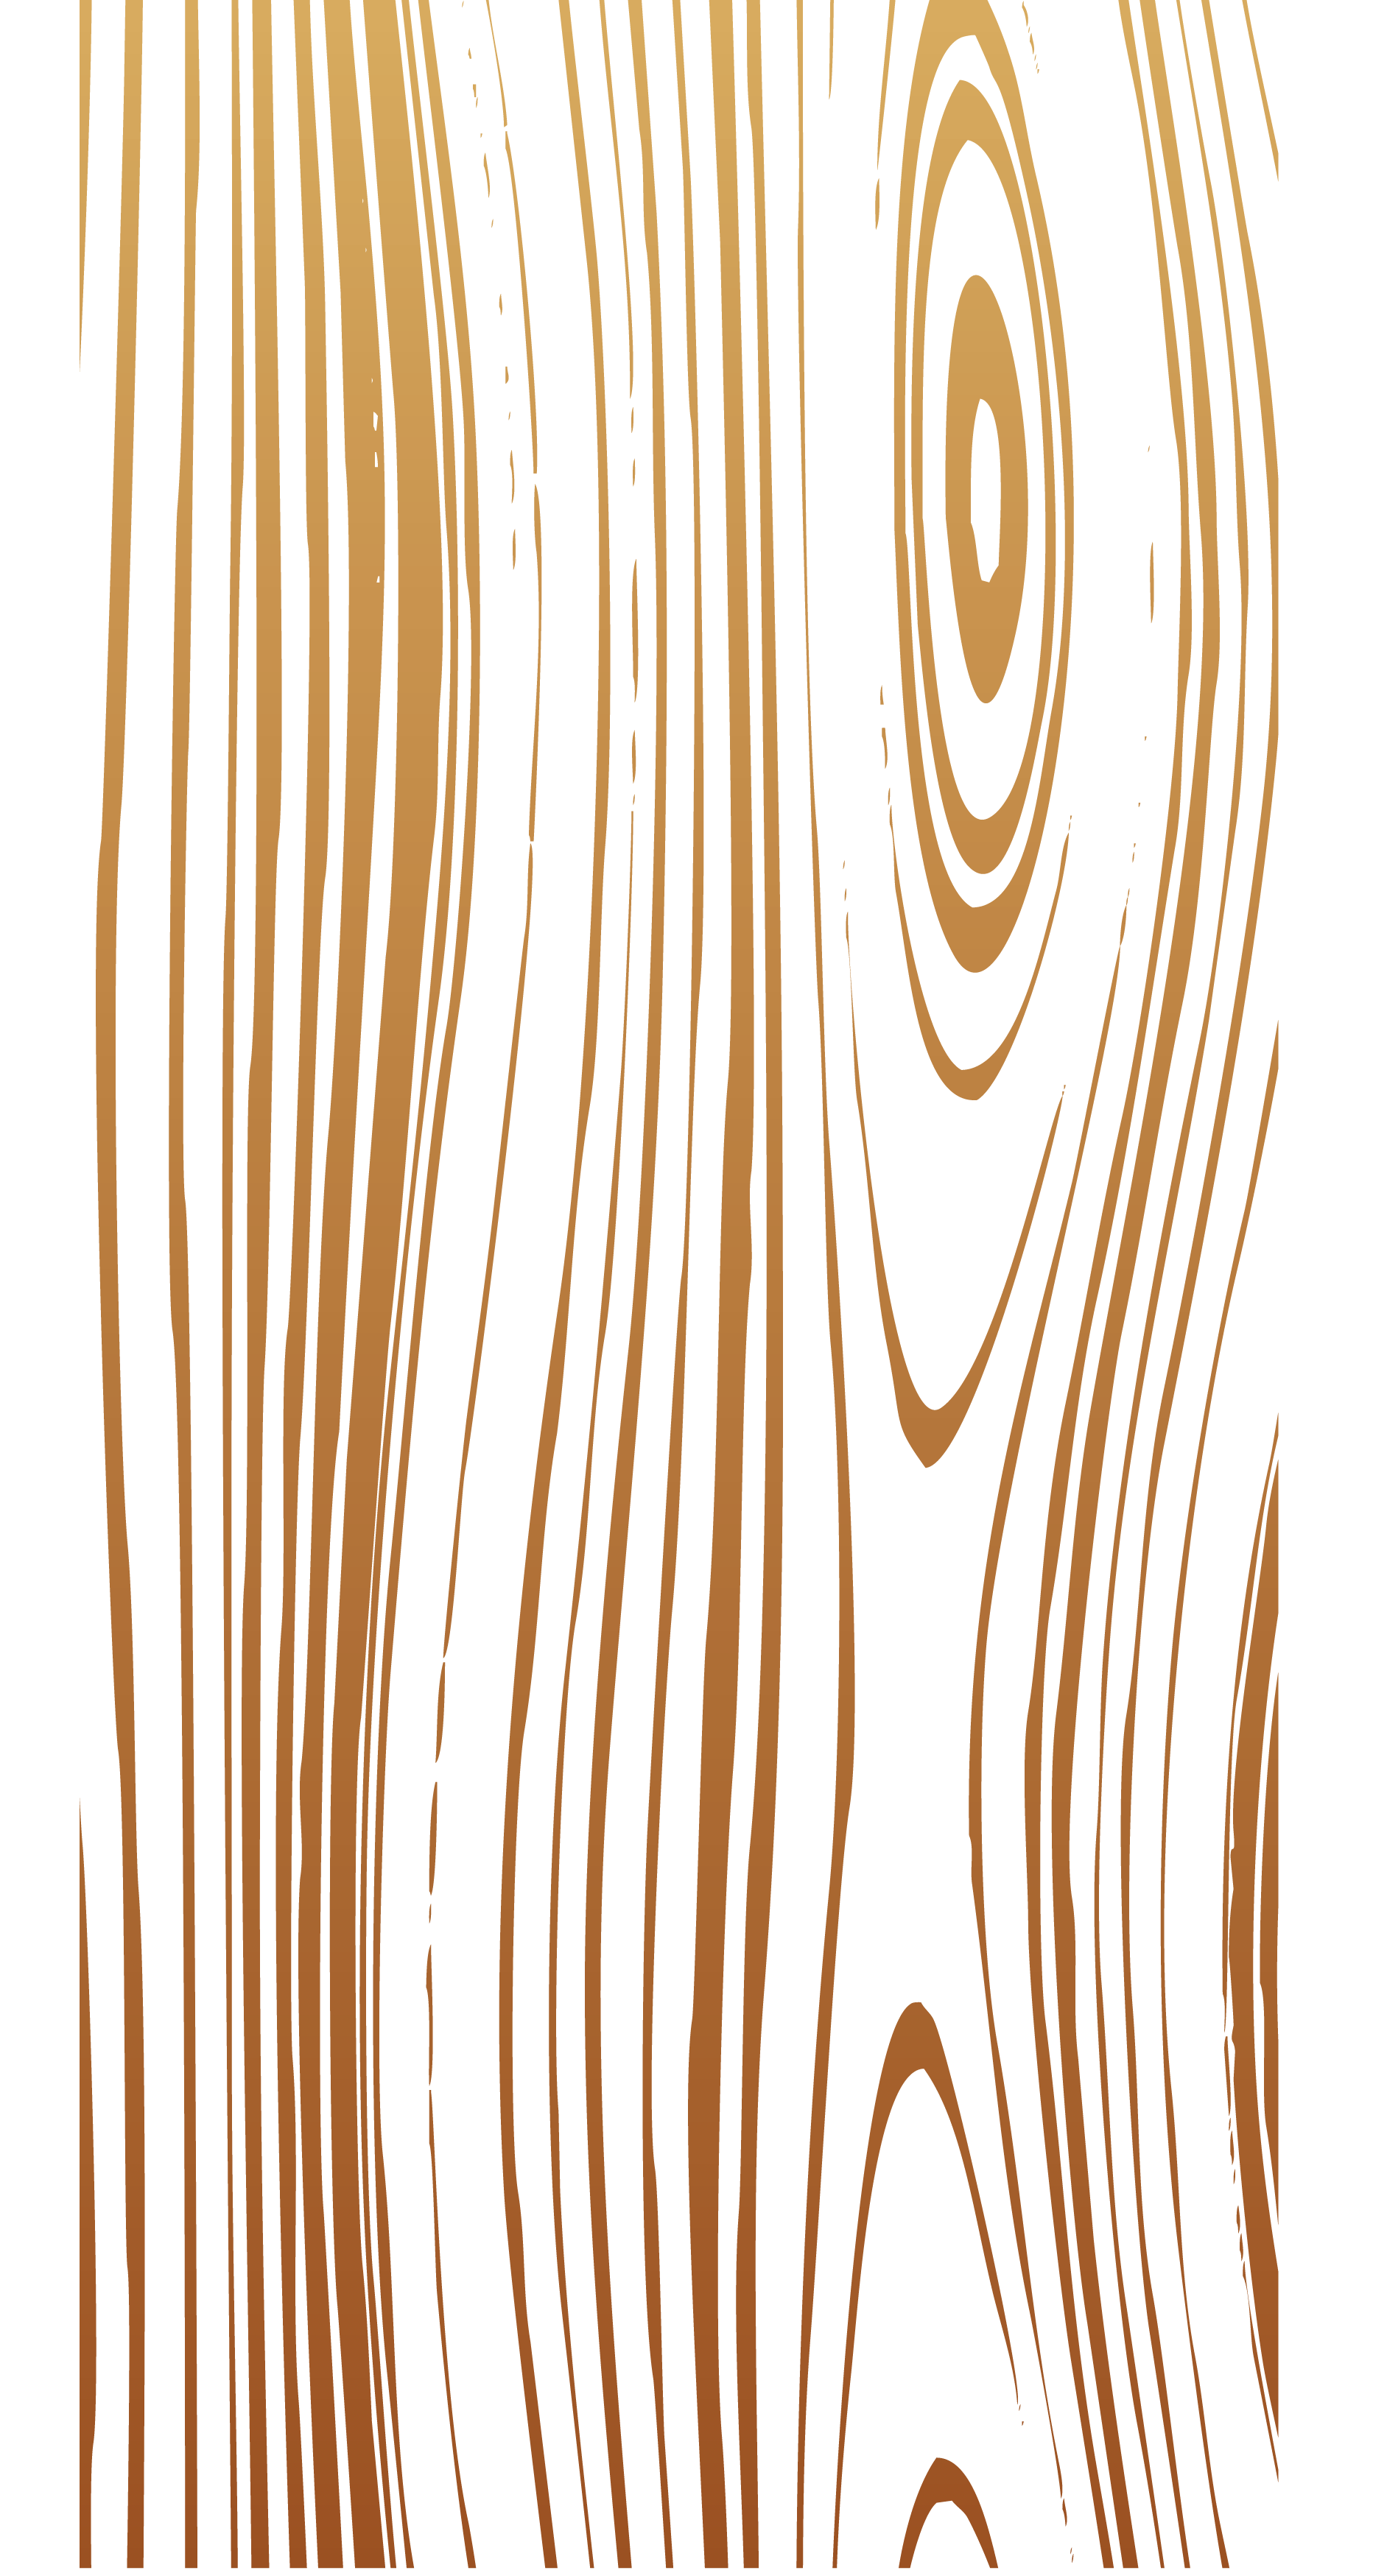 Transparent Wood Effect PNG Clipart.